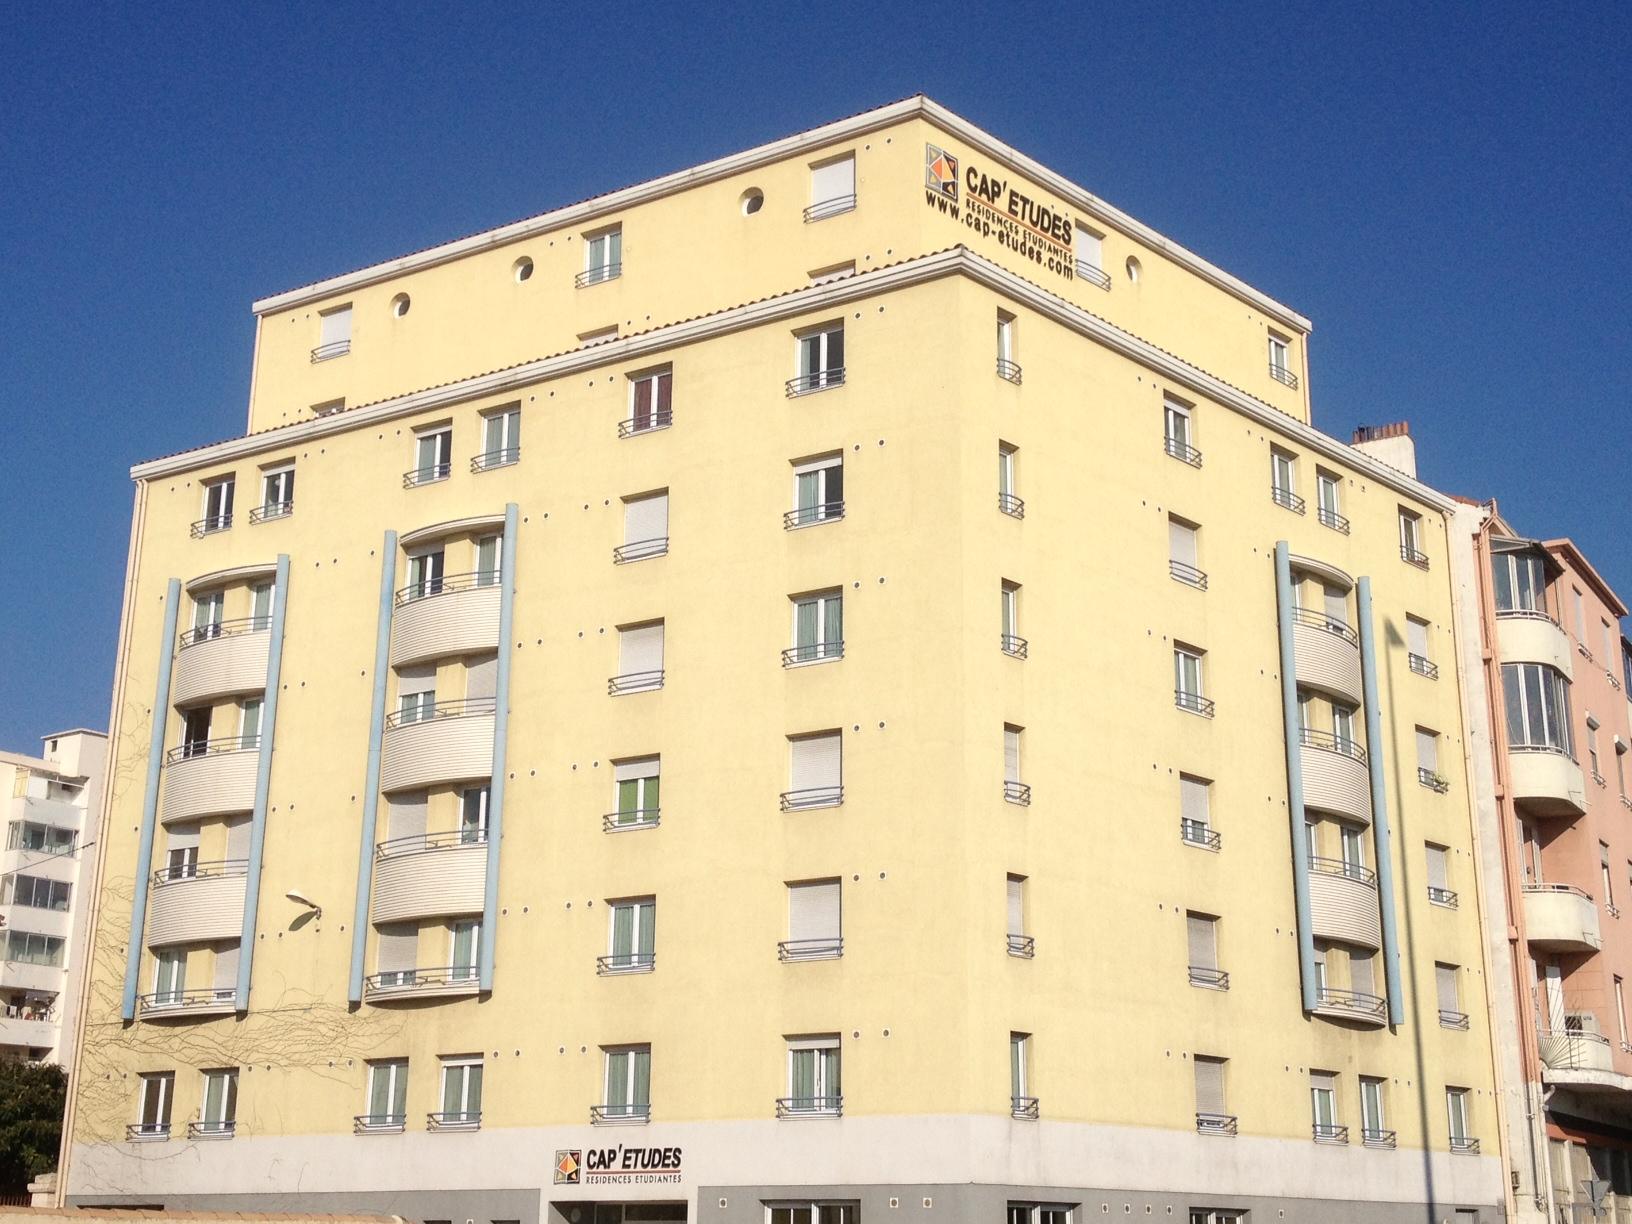 Location CAP ETUDES - CAP'ETUDES TIMONE - Marseille   10ème arrondissement (13010)